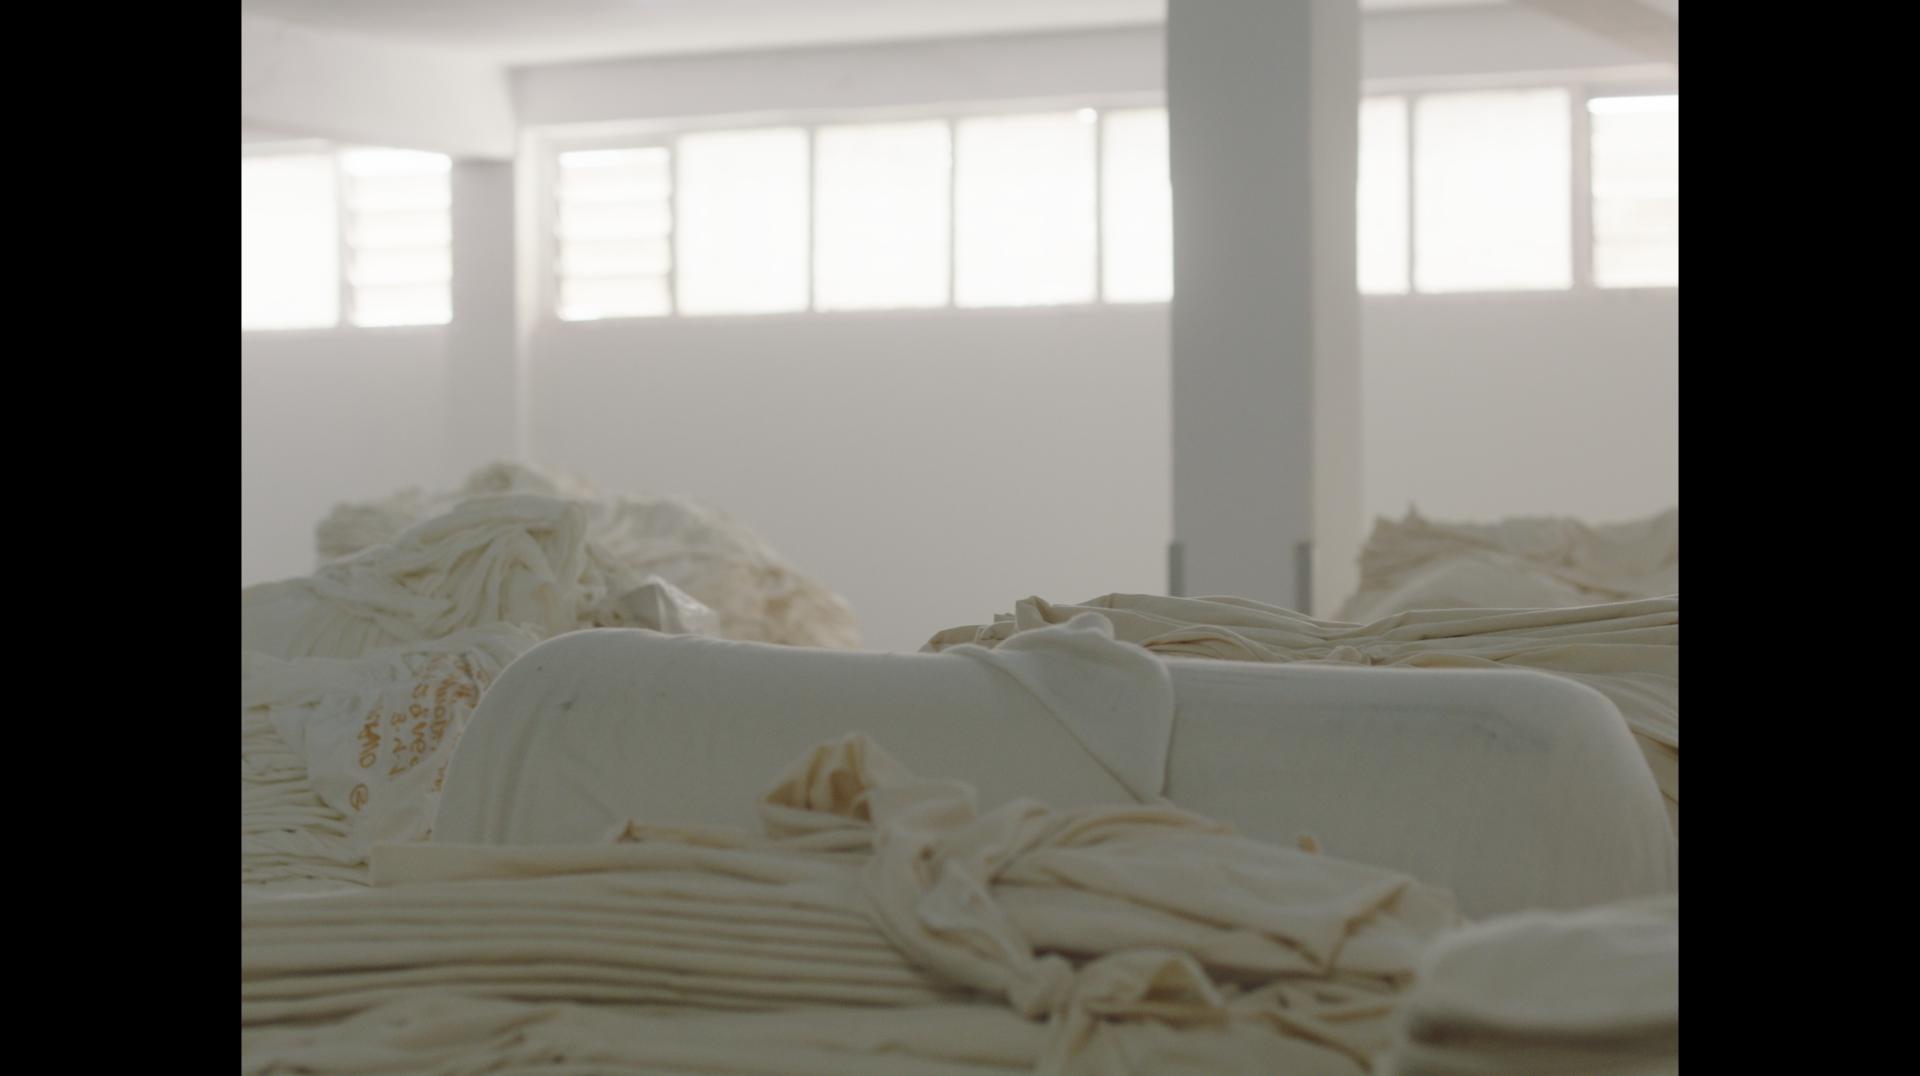 KYLE MACFADZEAN - Screen+Shot+2019-05-22+at+3.31.13+PM